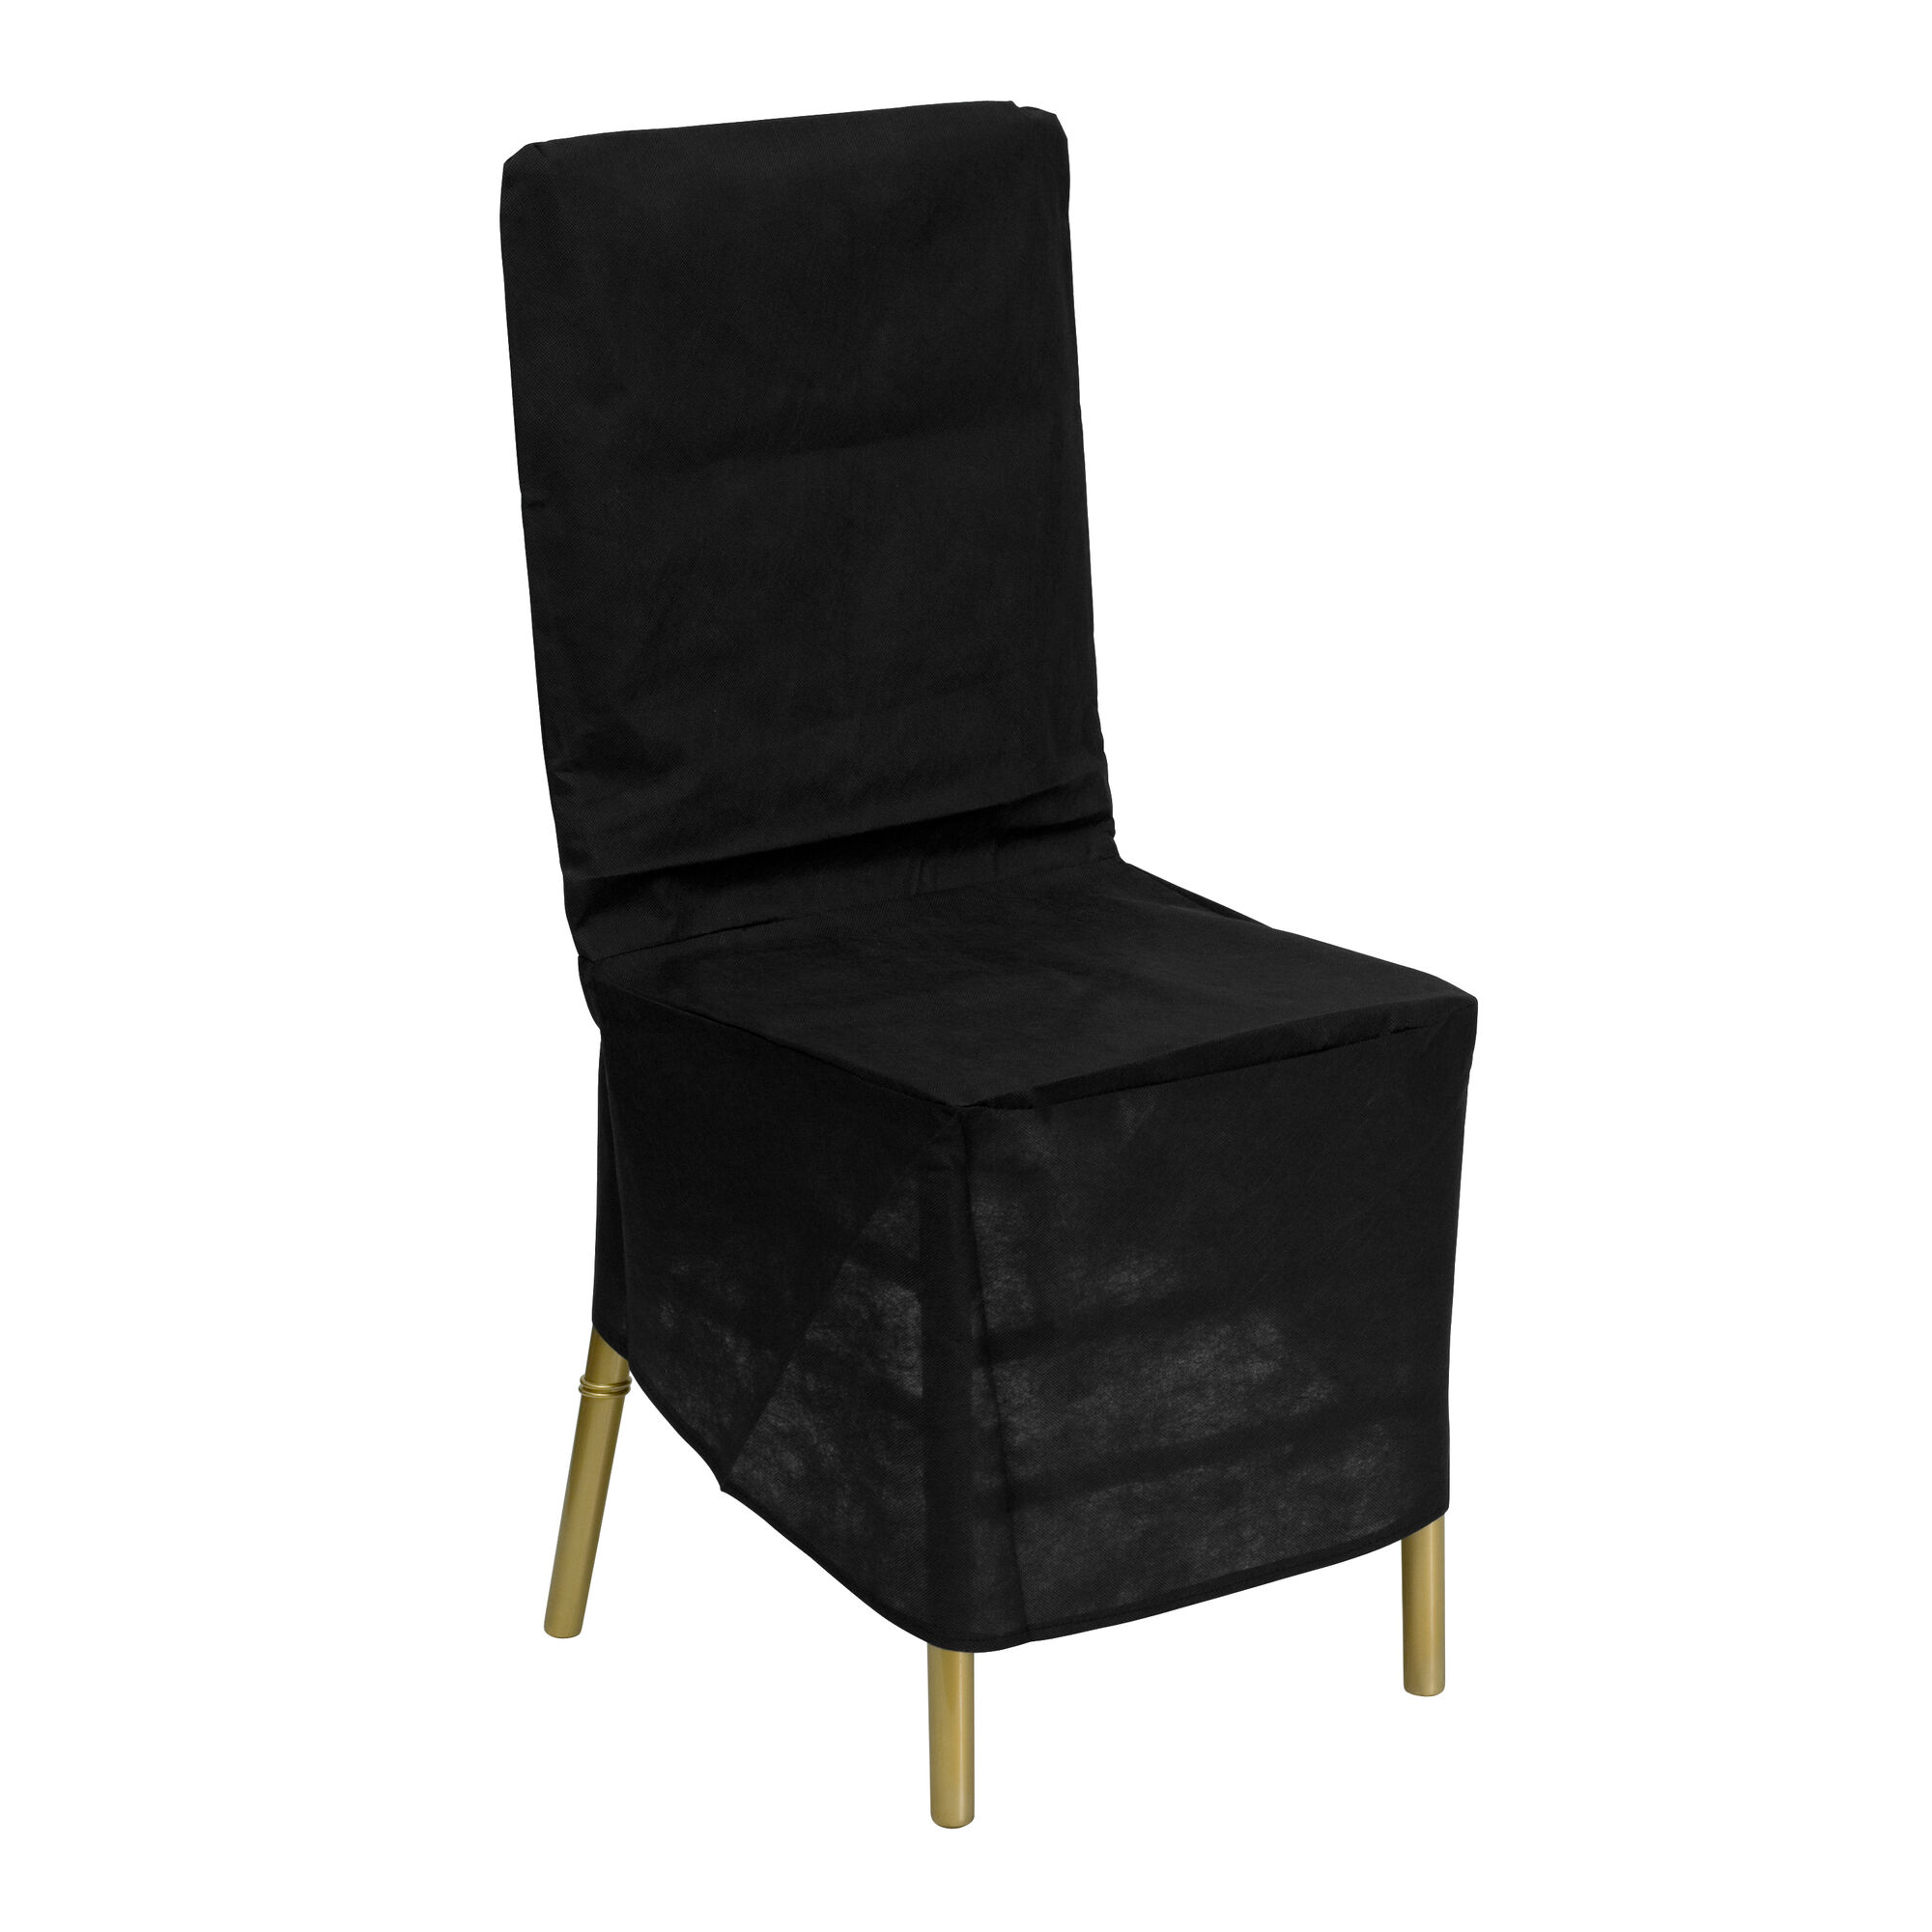 Amazing Black Fabric Chiavari Chair Storage Cover Machost Co Dining Chair Design Ideas Machostcouk